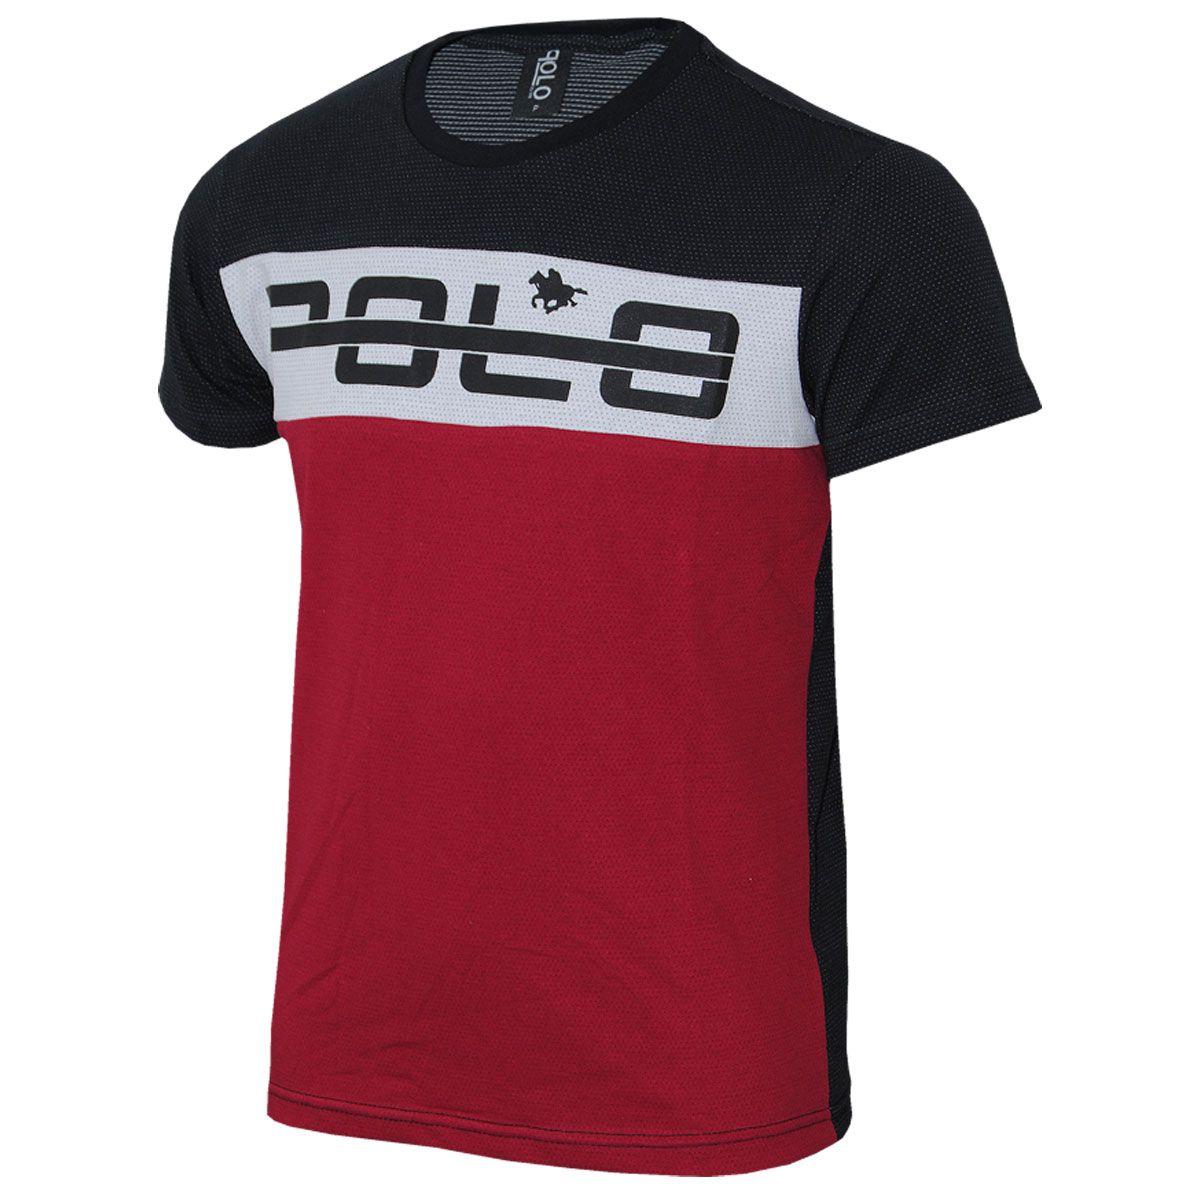 Camiseta em Malha Micro furos  Estampa e Recorte